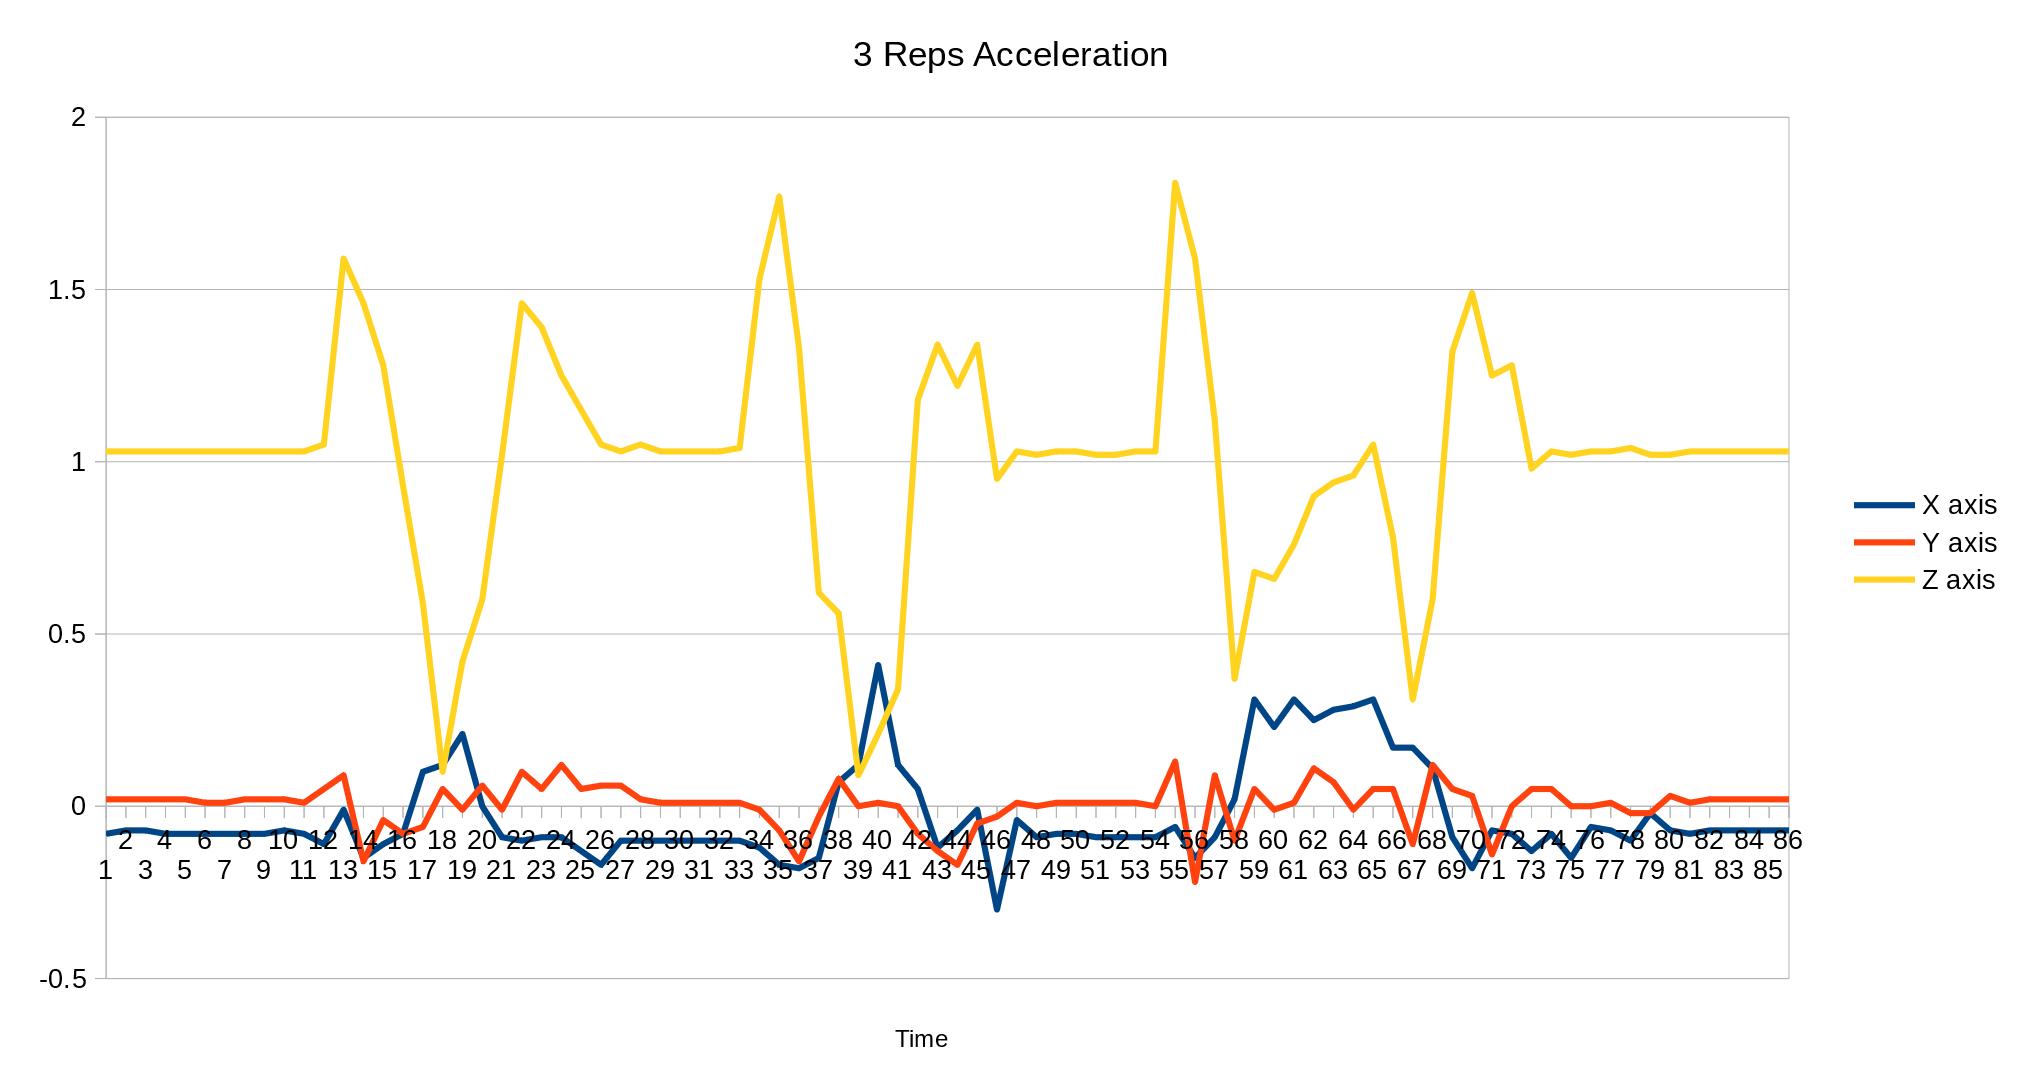 Acceleration Data